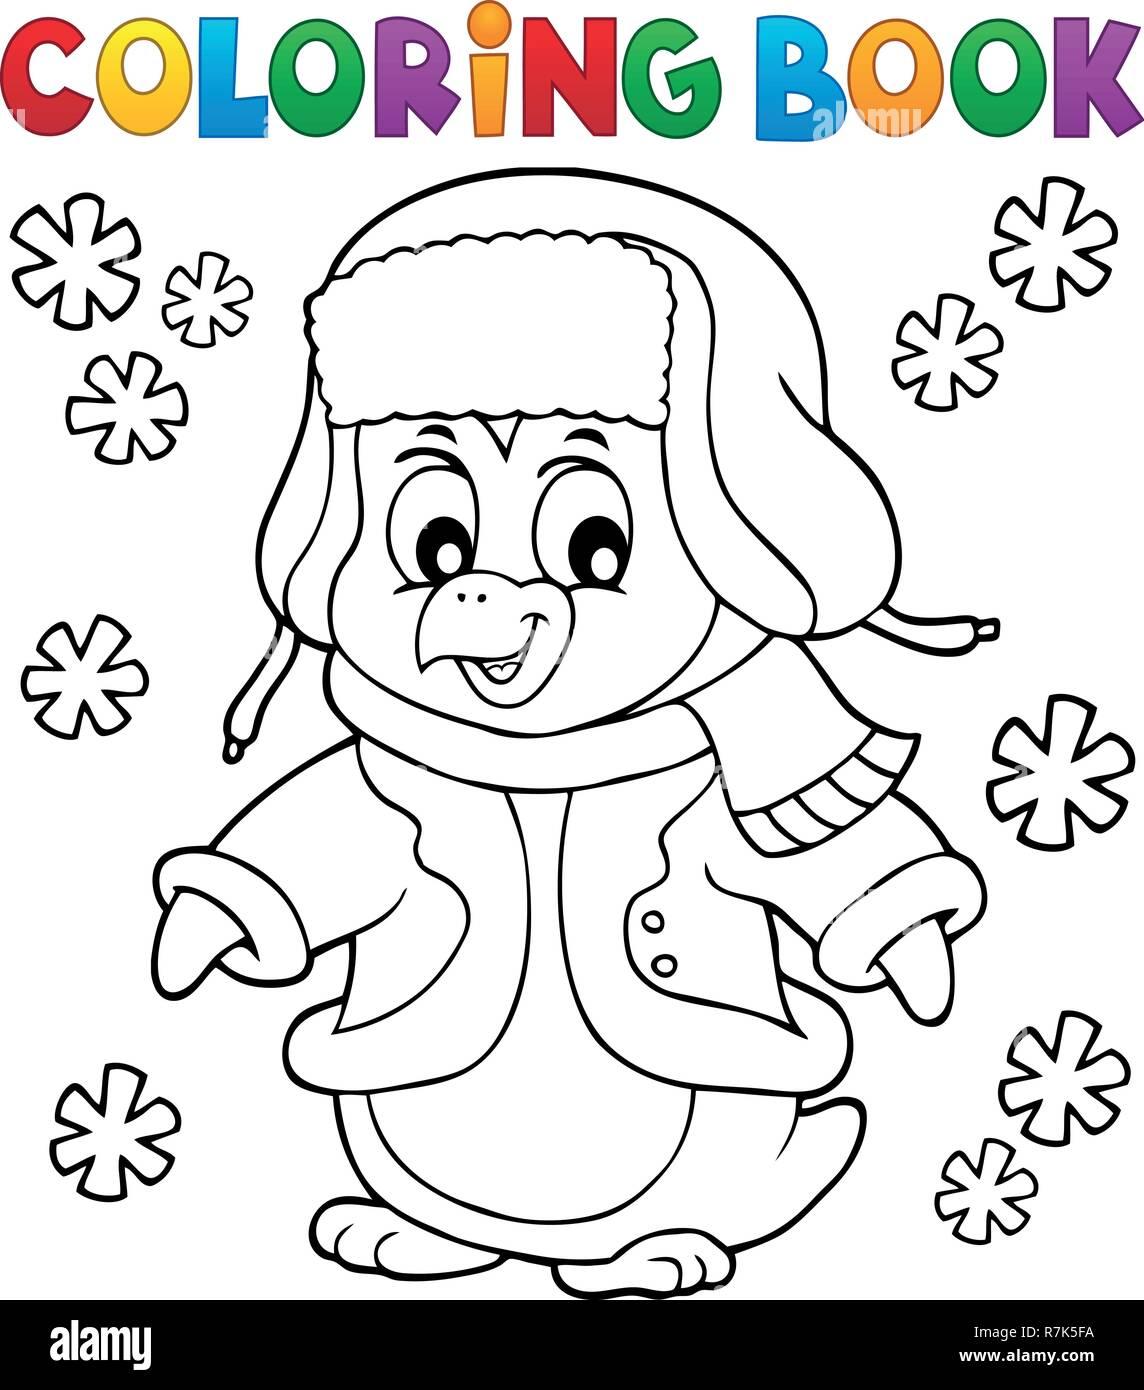 Malvorlagen Winter pinguin Thema 1 - Eps 10 Vector Illustration. Stock Vektor